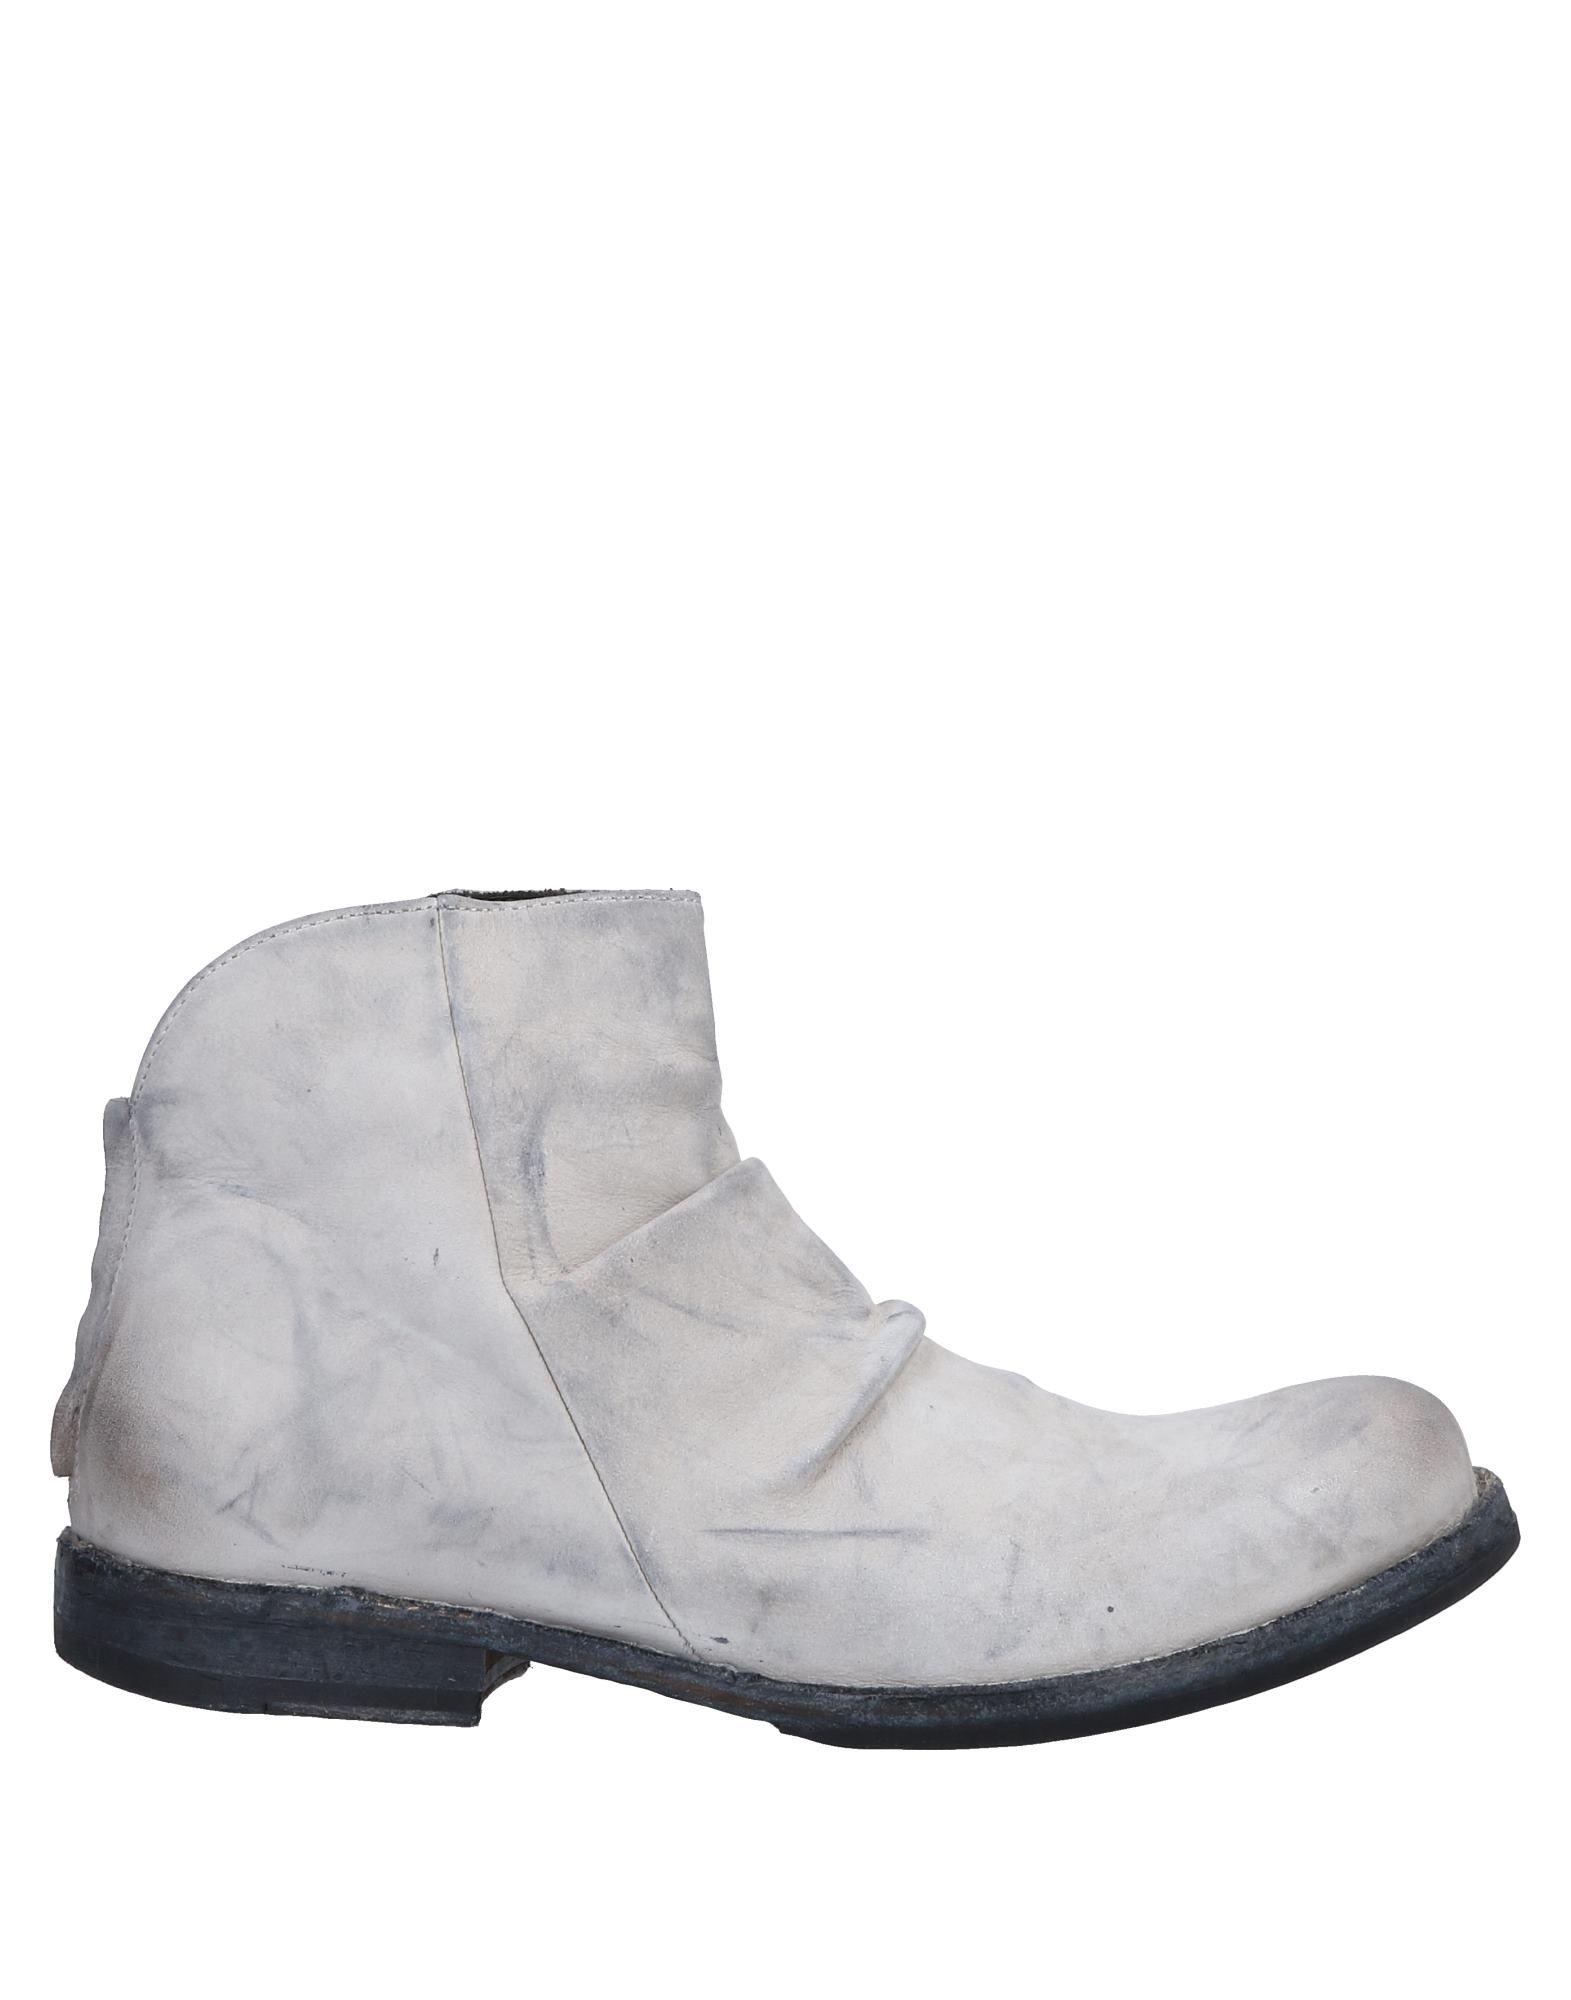 Stivaletti Open Closed  scarpe donna - 11569493GD 11569493GD  sehr berühmt